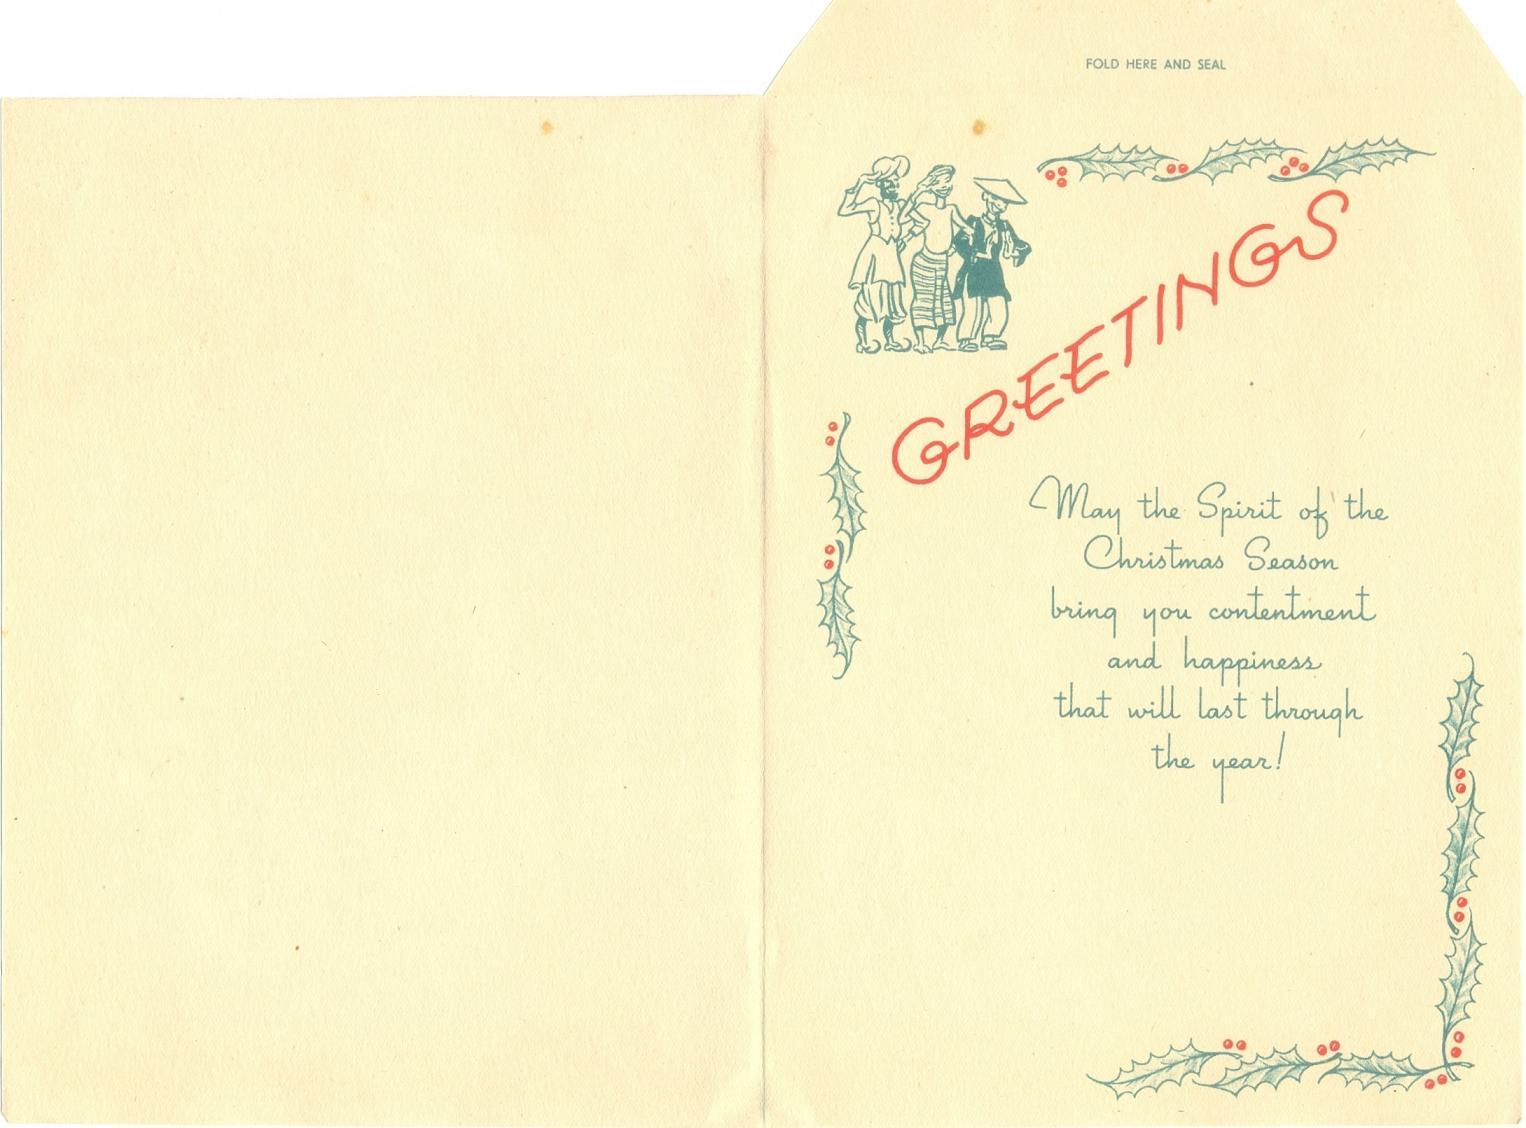 Philatelic Incarnation Christmas Greetings Card Cbi Theater Wwii